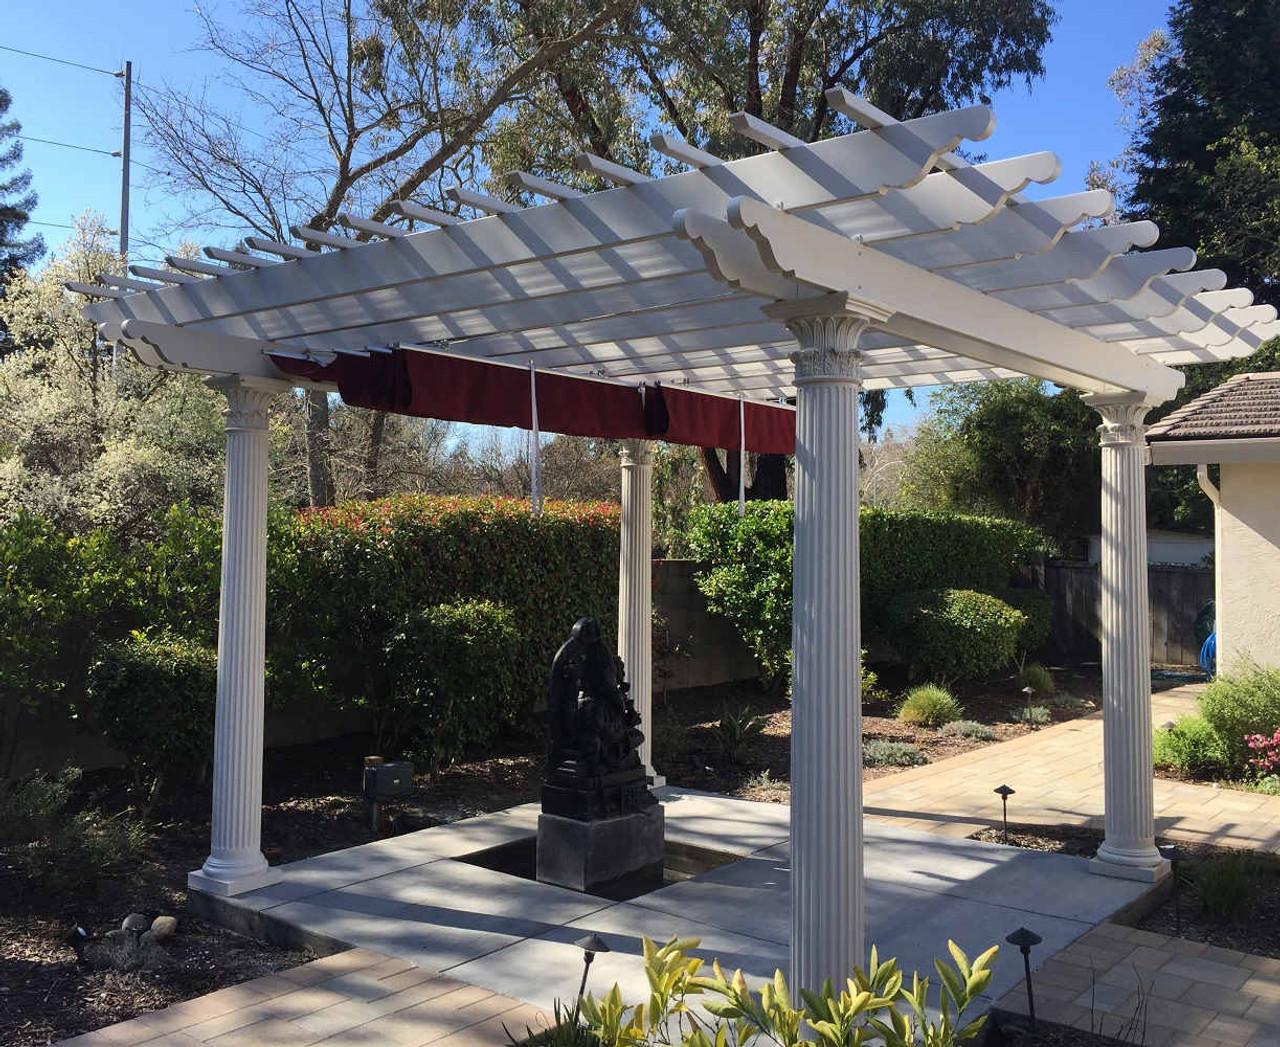 16x16 Fiberglass Pergola with Retractable Canopy, Danville, California